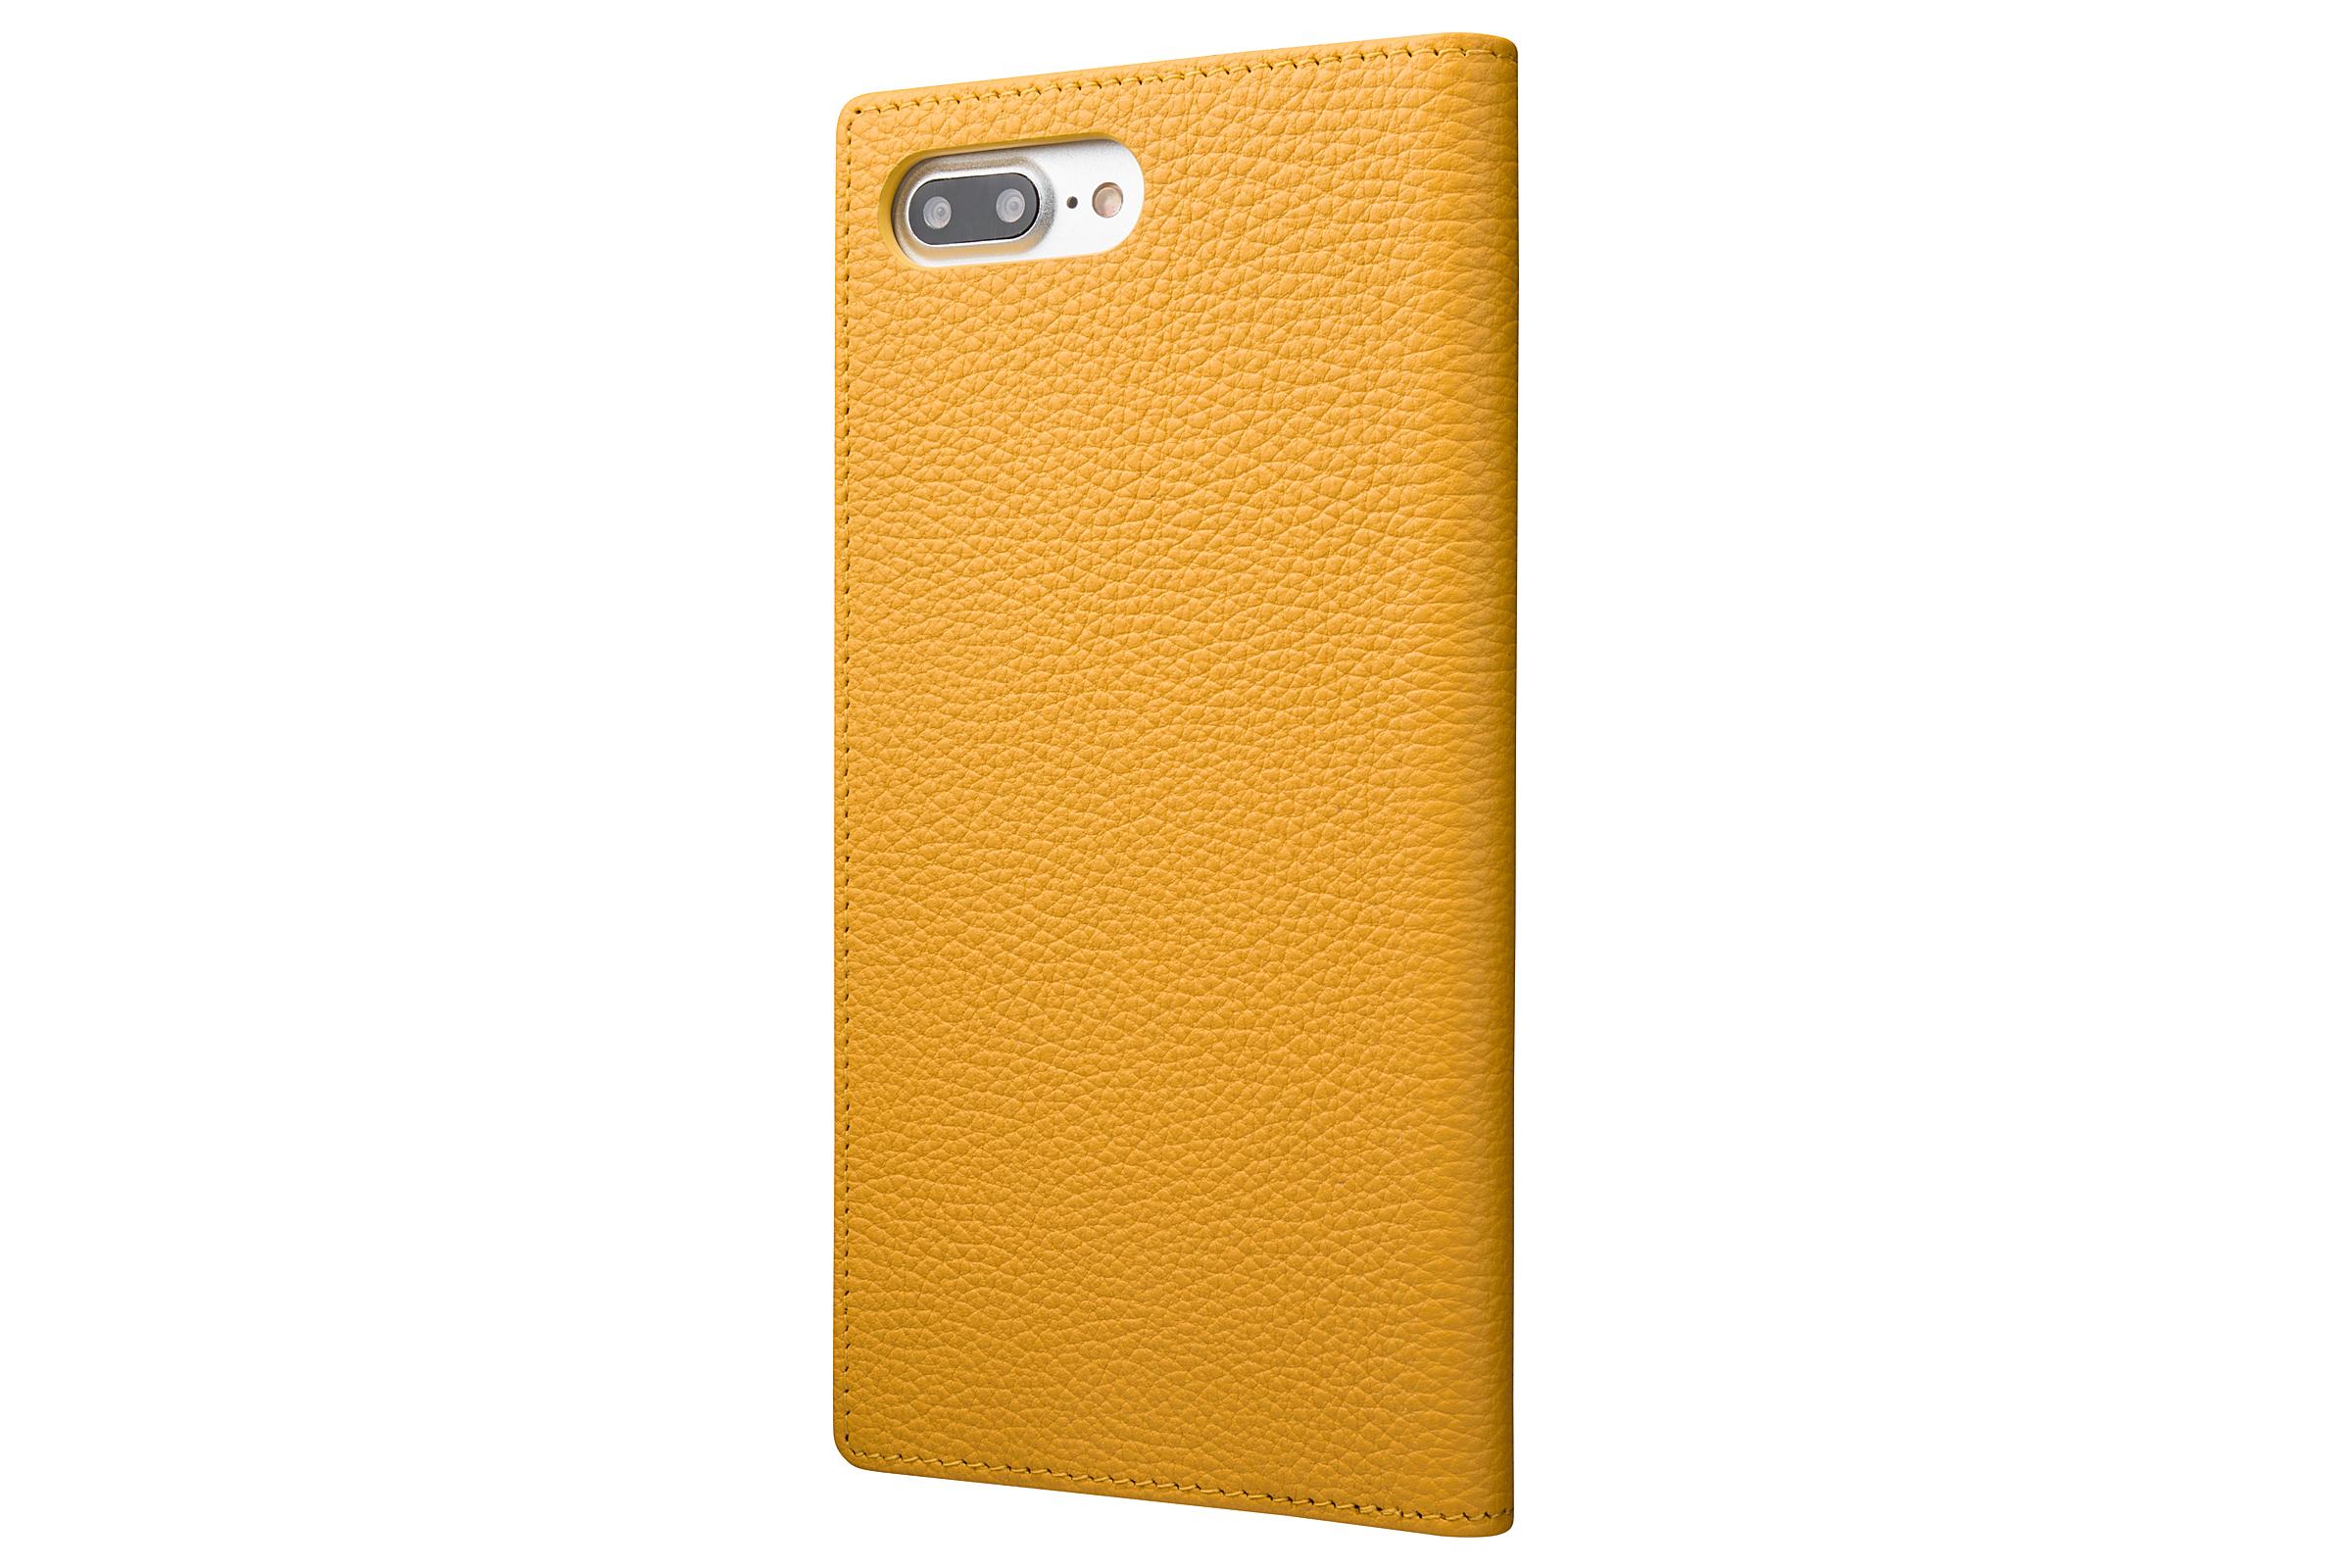 GRAMAS Shrunken-calf Full Leather Case for iPhone 7 Plus(Yellow) シュランケンカーフ 手帳型フルレザーケース - 画像2